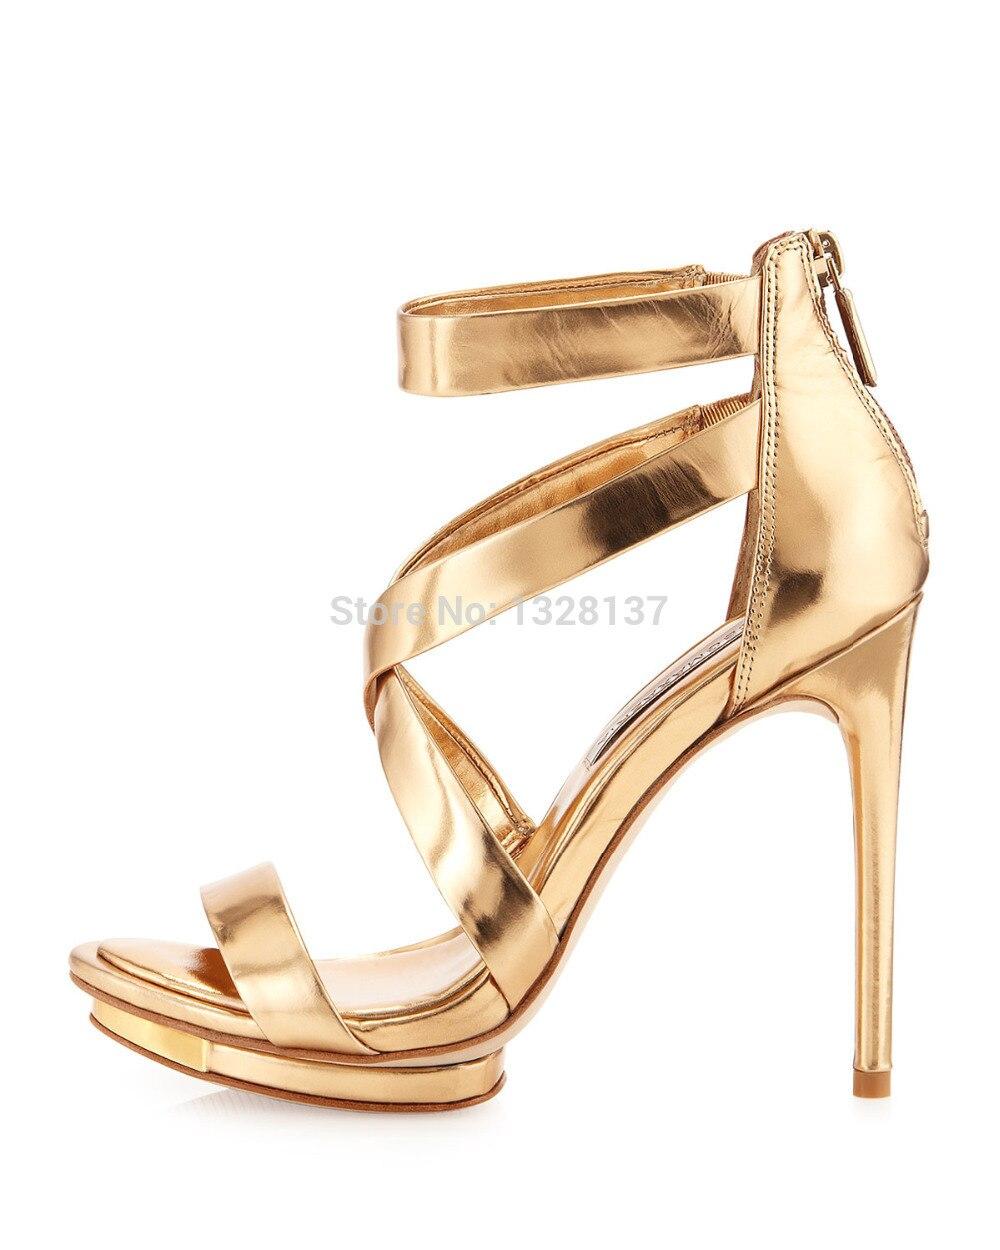 8b29d11d3f0 gold ladies flat sandals shoes women wedge wedding shoes sandalias  femininas bowknot peep toed shoes cheap